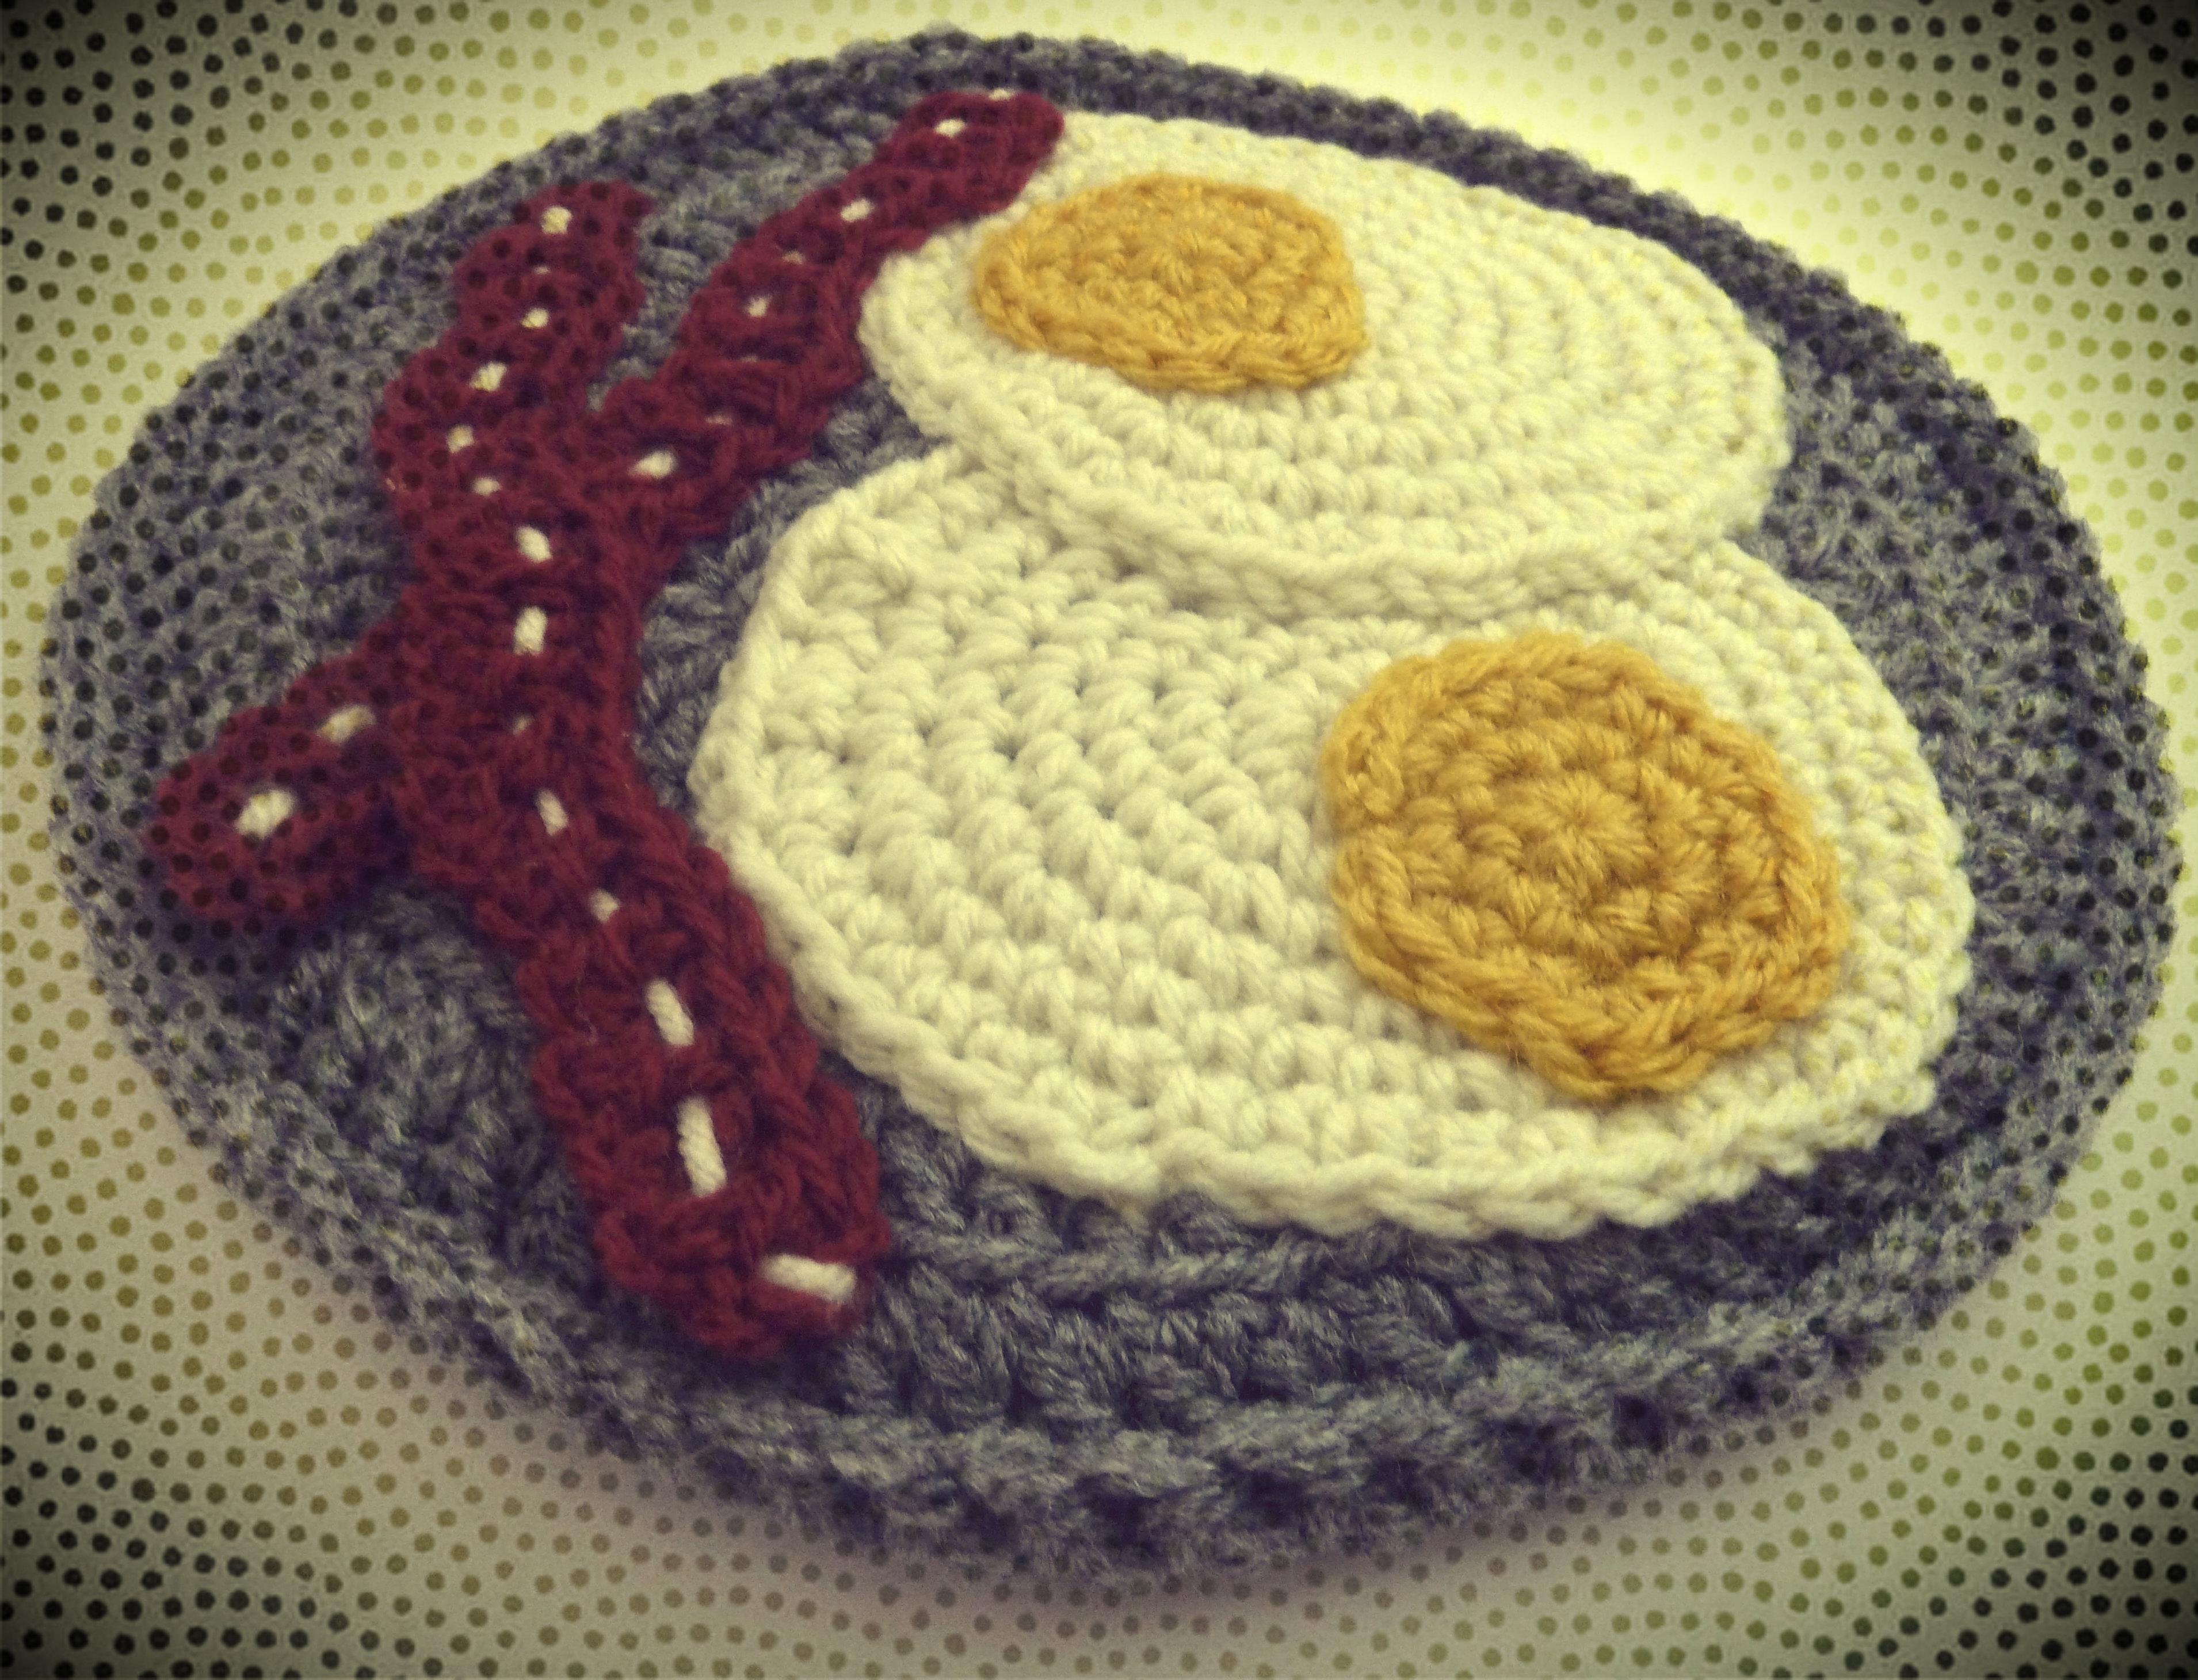 Crochet Trivets Hot Pads Free Eggs Bacon Potholder Crochet Pattern Book People Studio